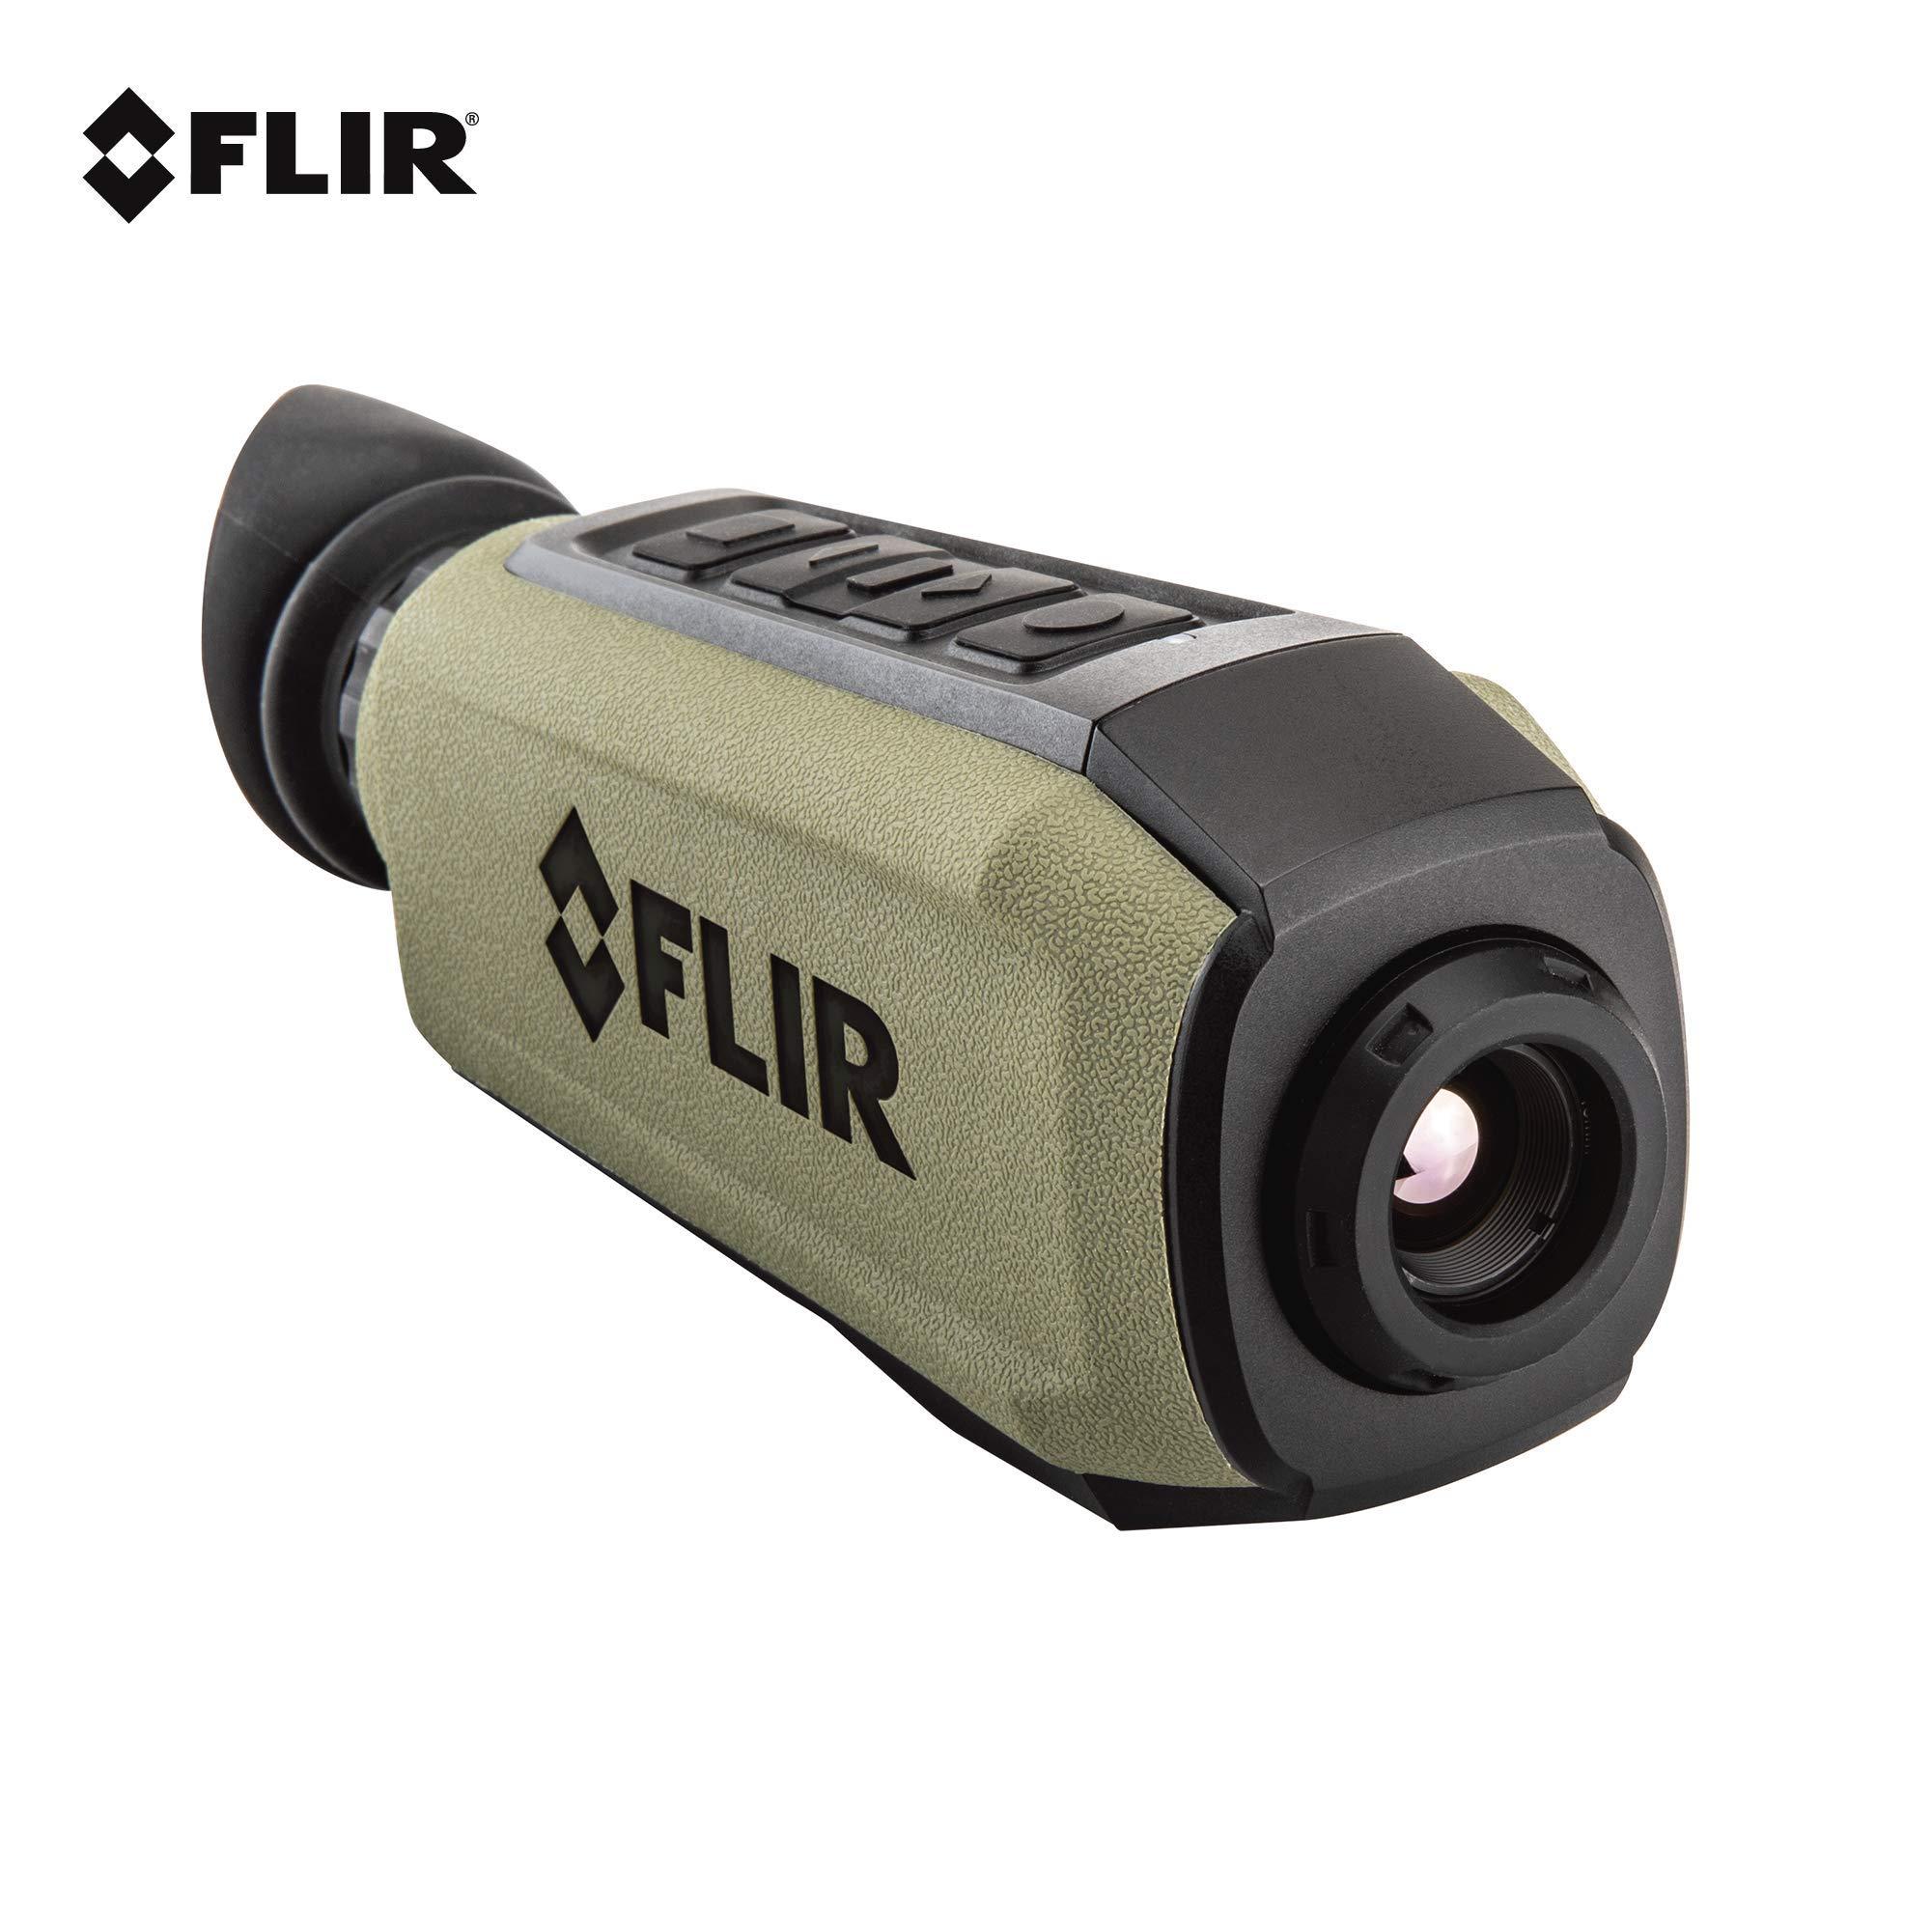 FLIR Scion OTM 60Hz 320 Thermal Imaging Monocular 14mm by FLIR Systems, Inc.